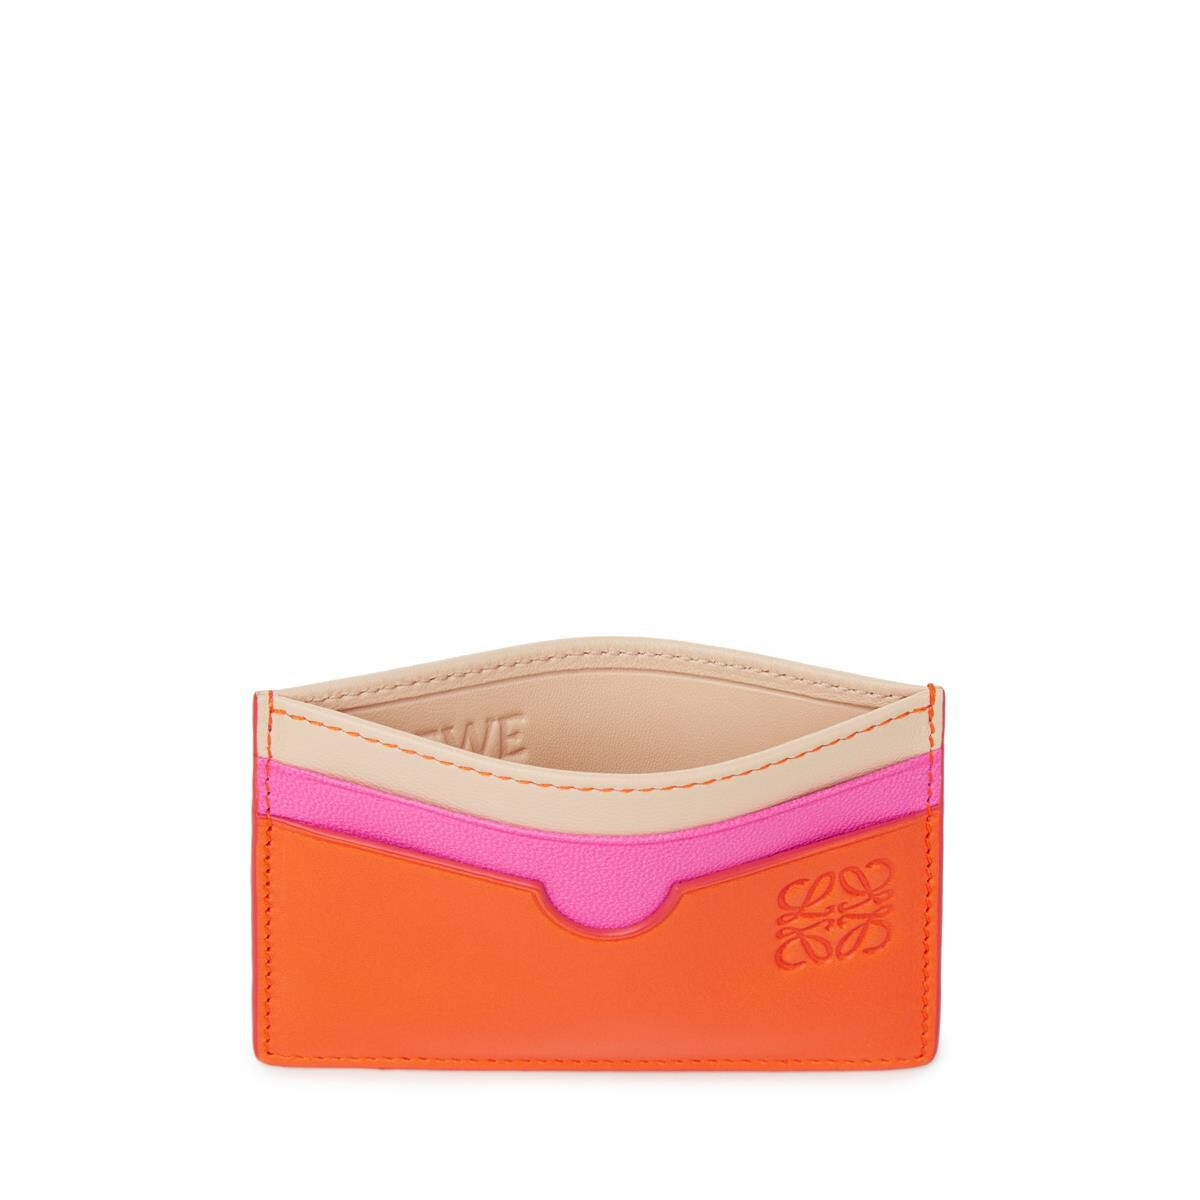 LOEWE Plain Card Holder Orange/Multicolor all